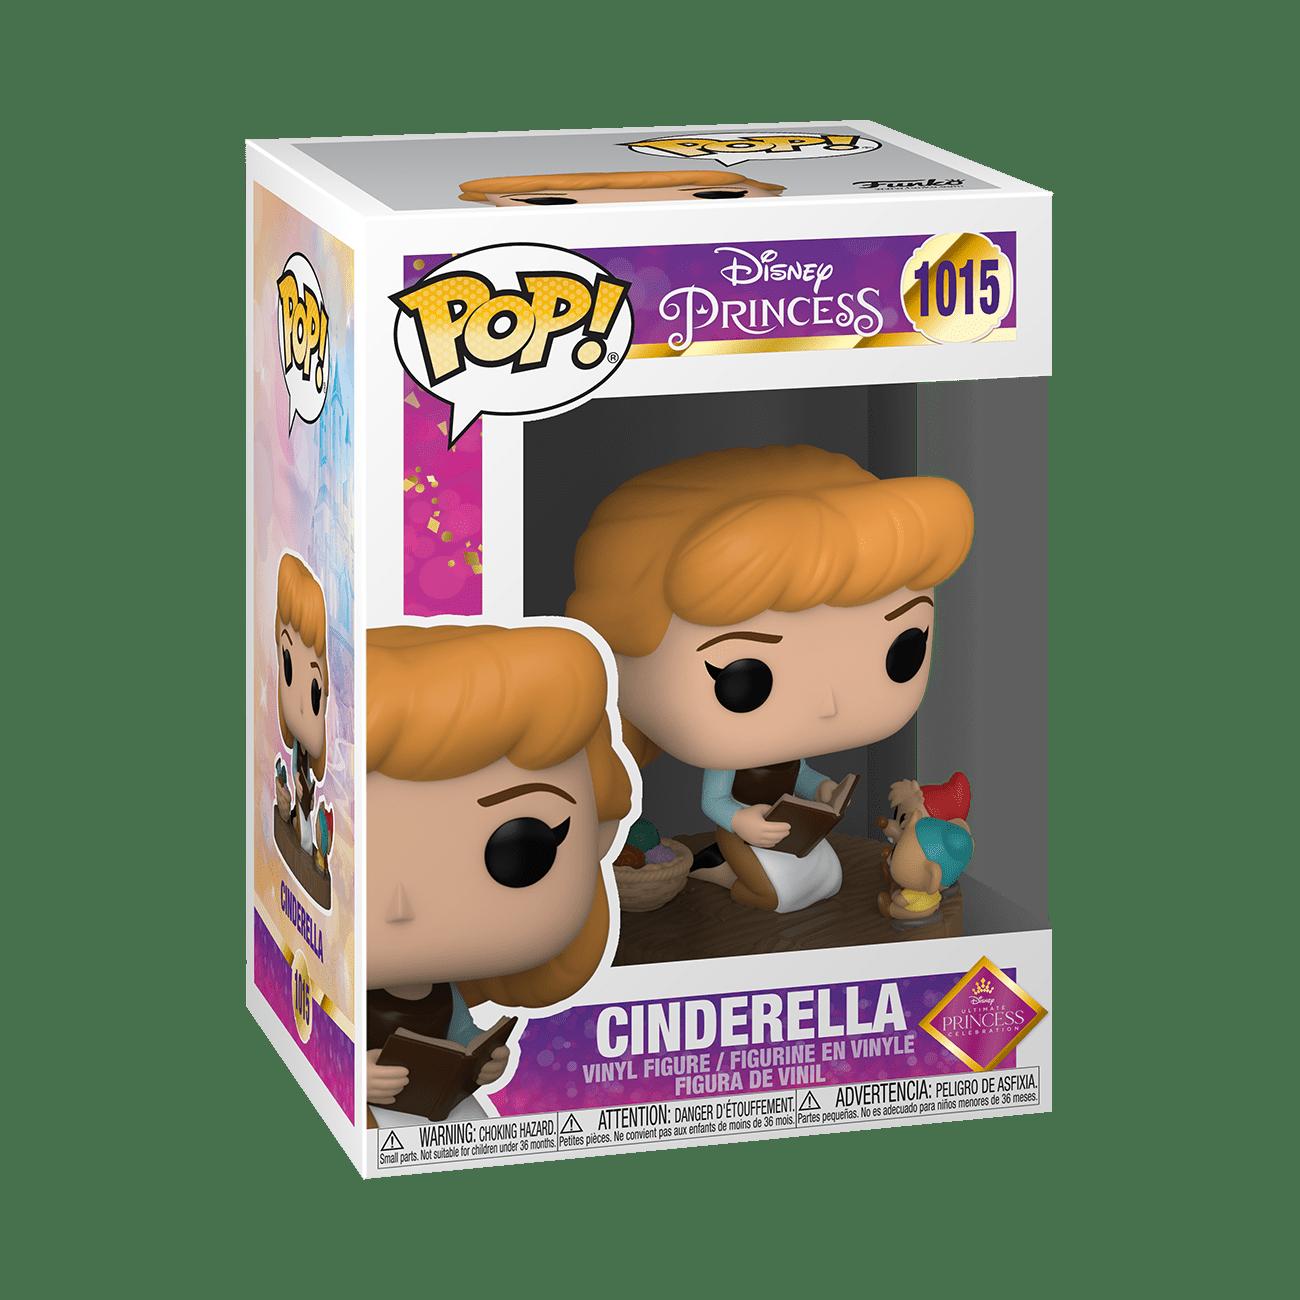 cinderella ultimate princess funko pop!